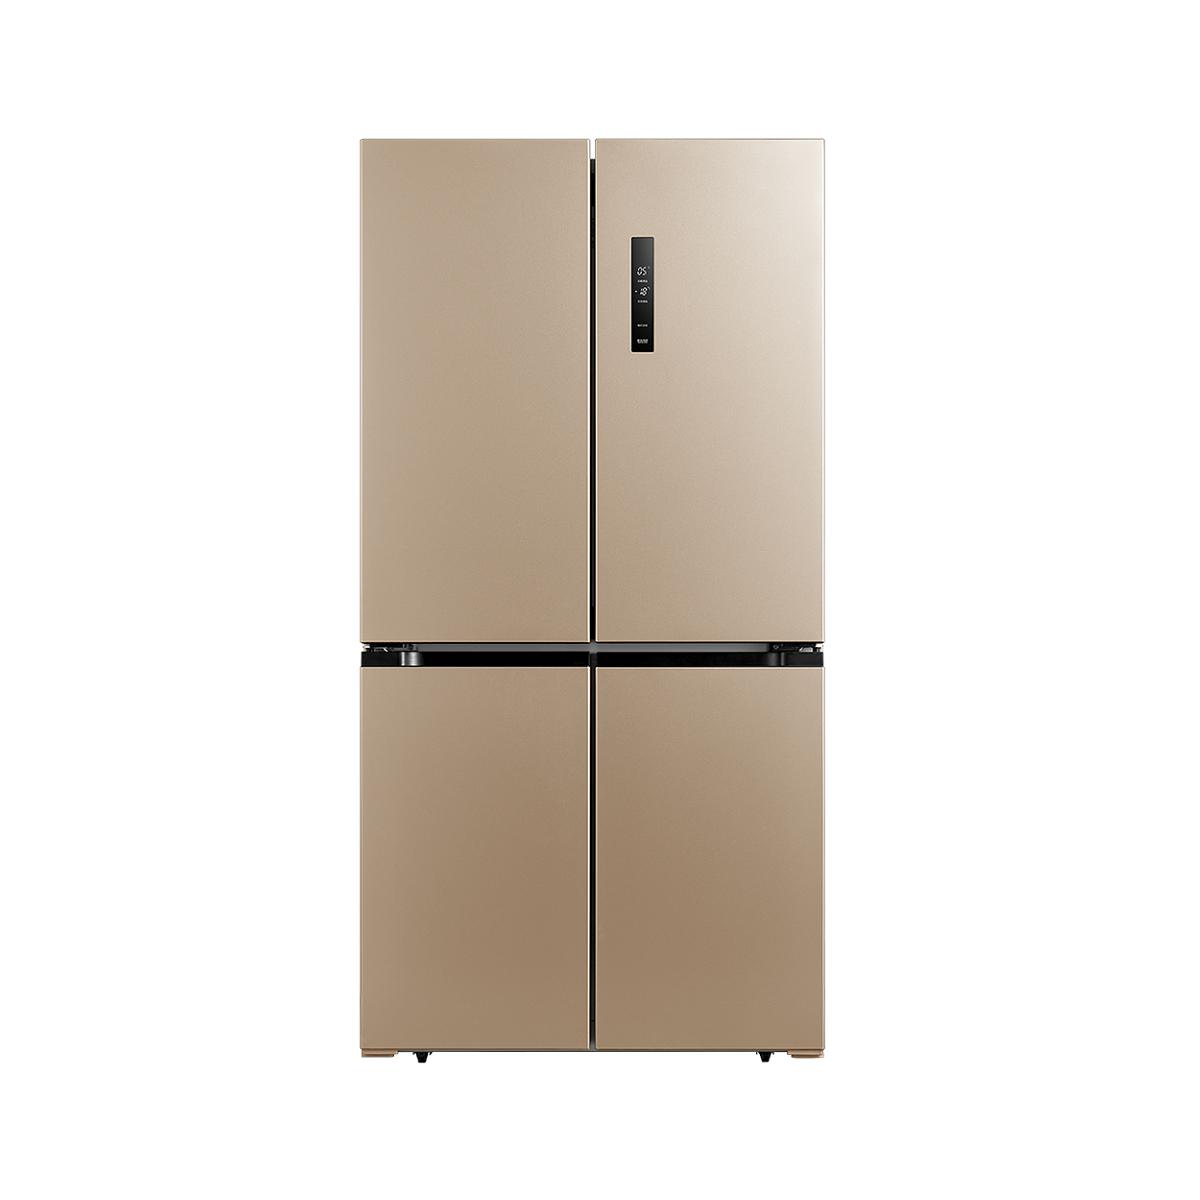 Midea/美的 BCD-505WTPZM(E)冰箱 说明书.pdf